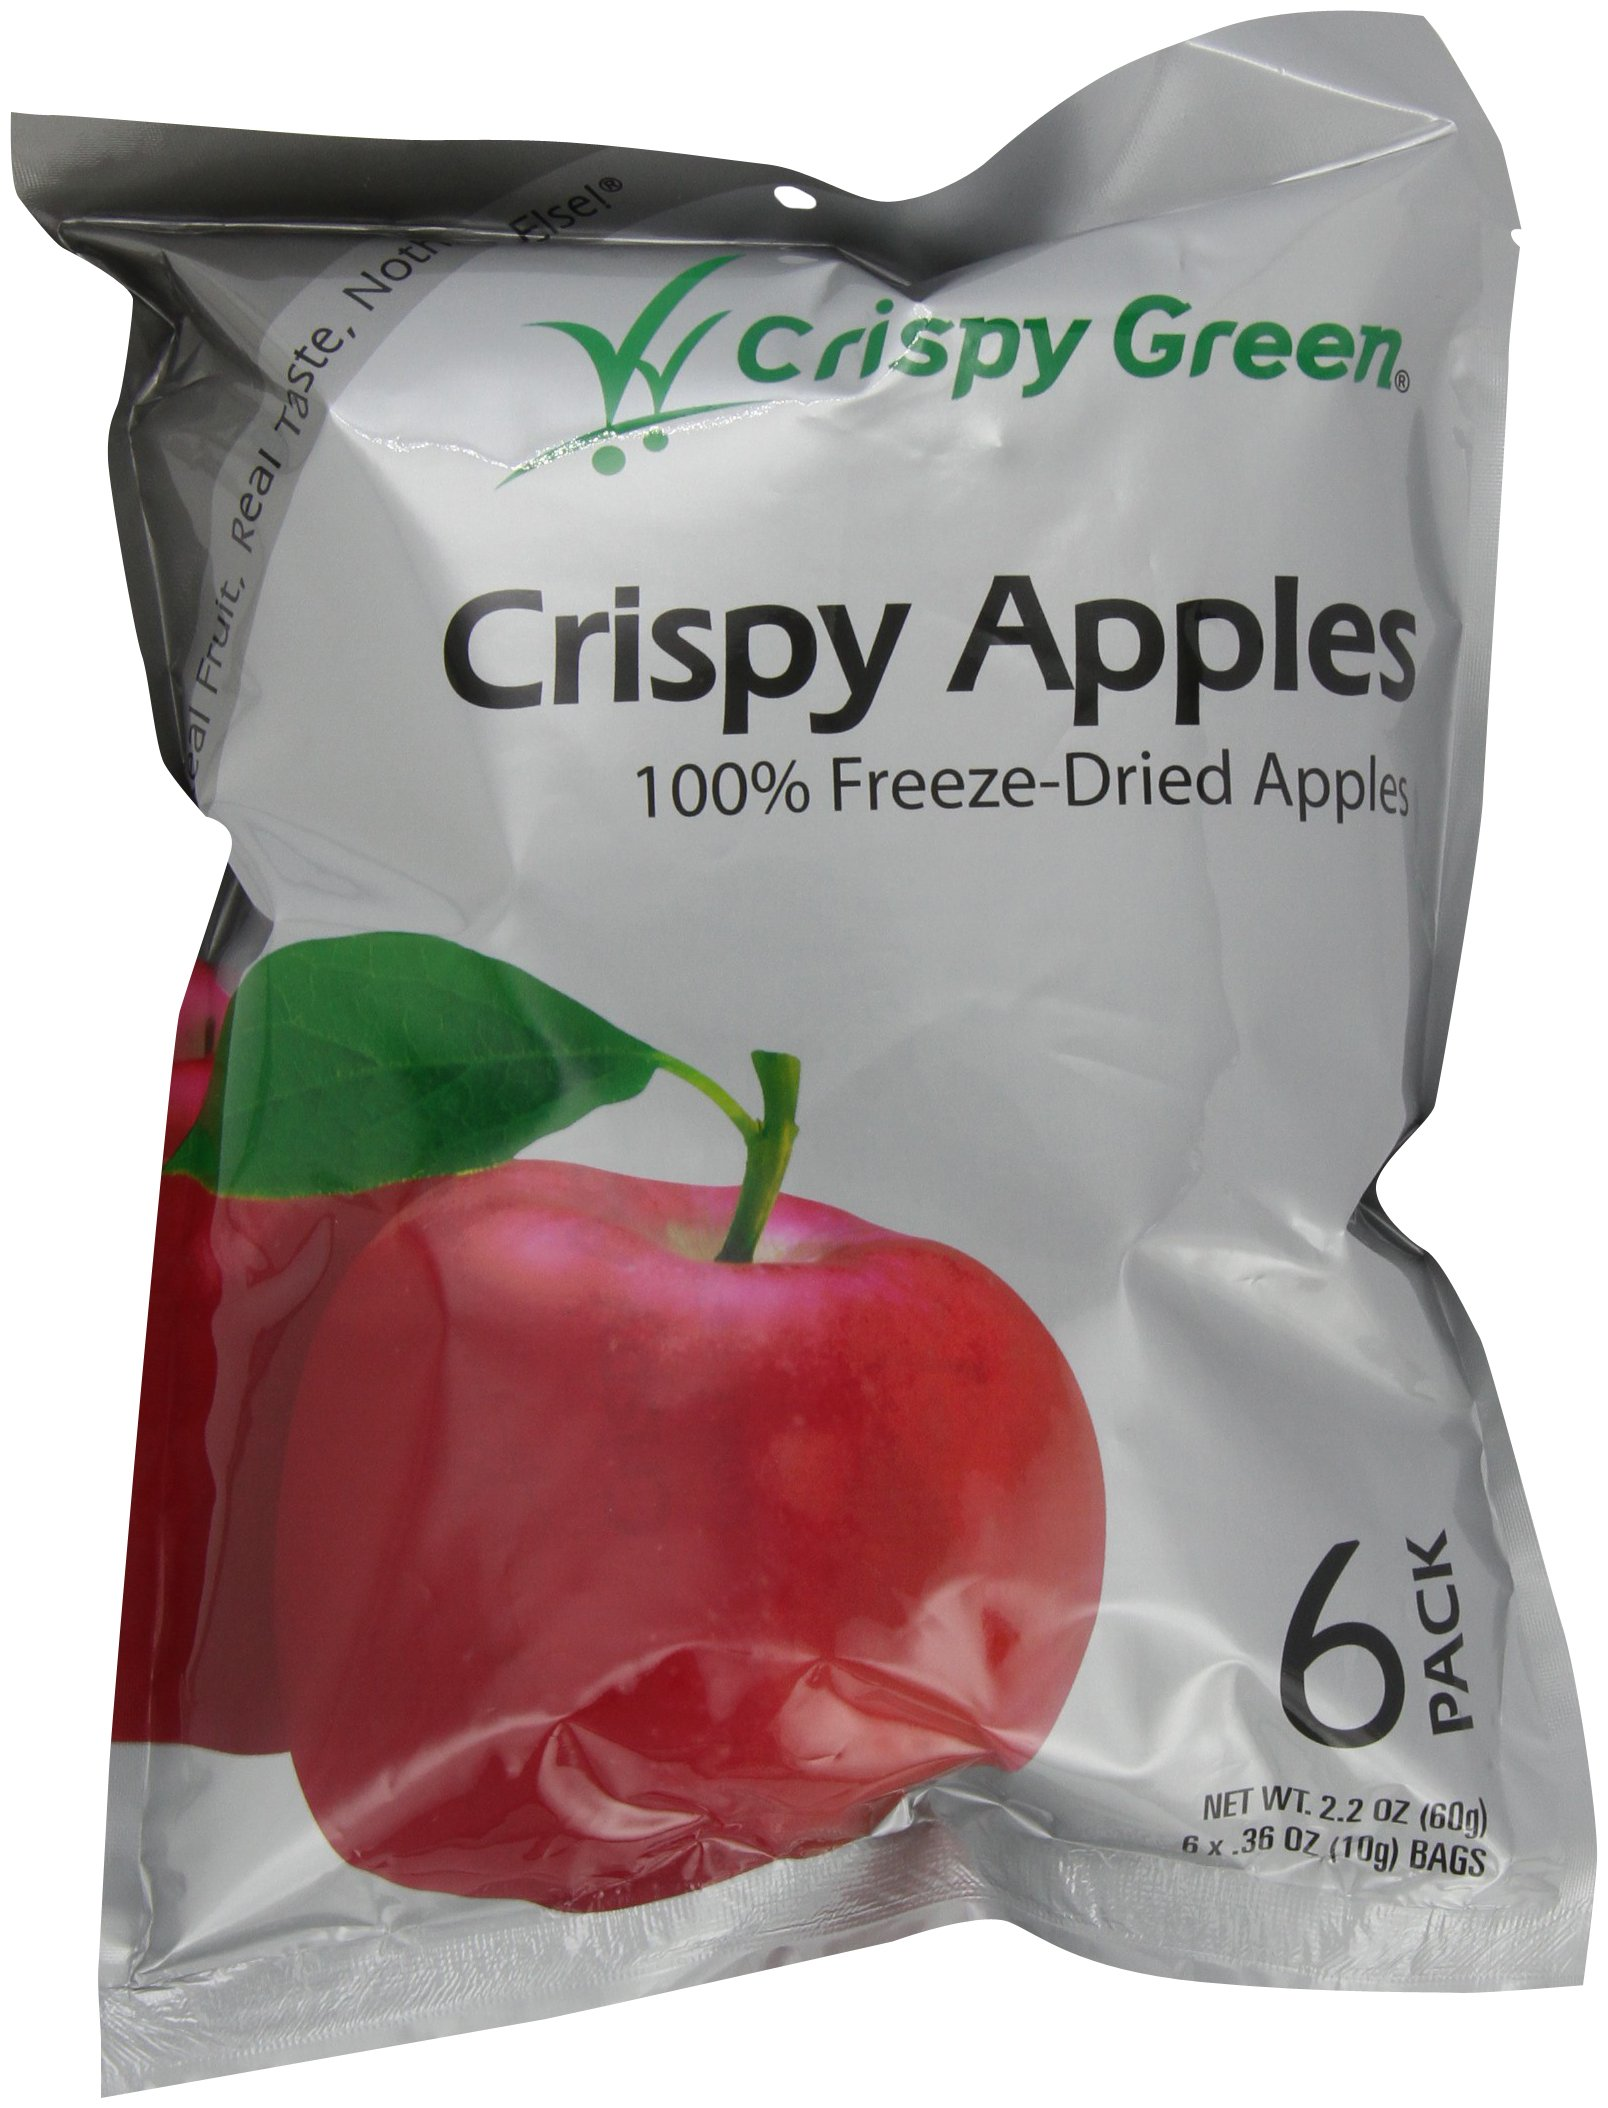 Crispy Green Fruit Snacks, Crispy Apples, 2.2-Ounce Pouches (Pack of 3) by Crispy Green